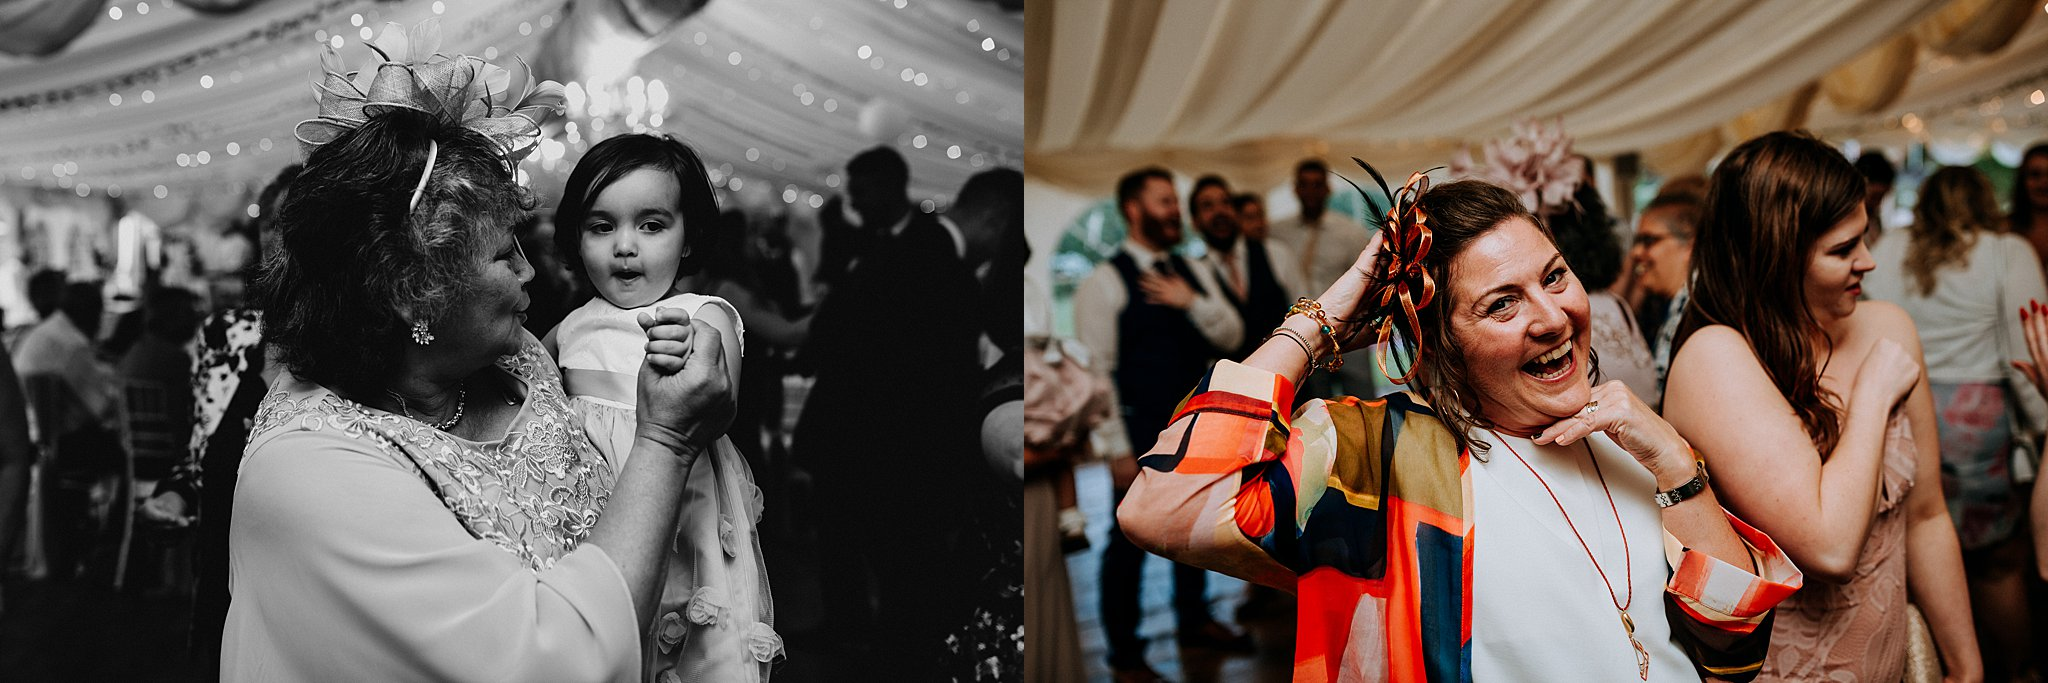 Wedding Photographer The Walled Garden